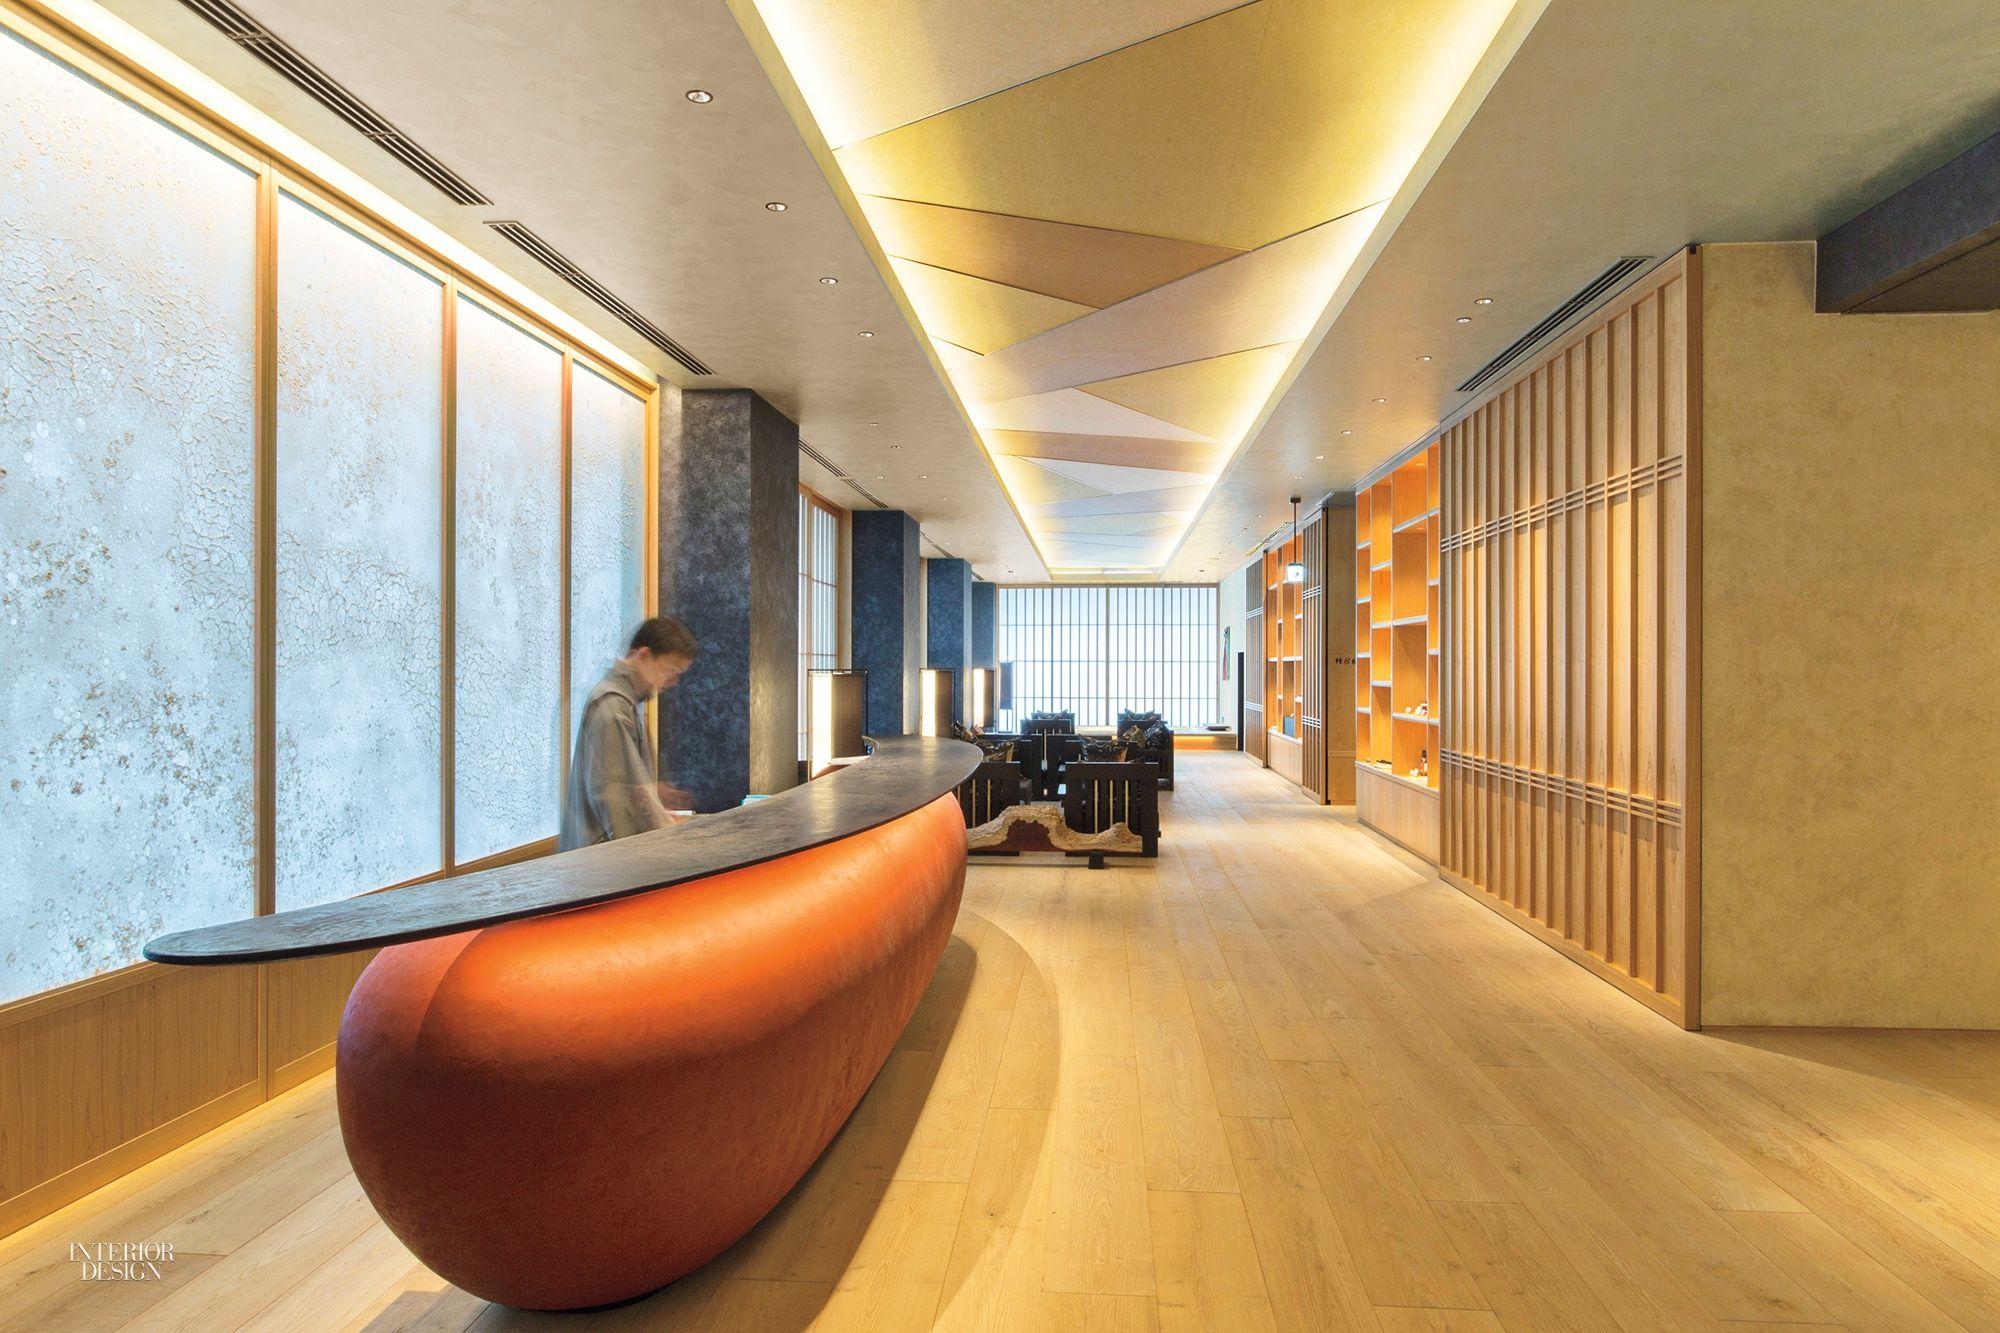 Hoshinoya Tokyo Spa Hotel By Rie Azuma Reinvents The Traditional